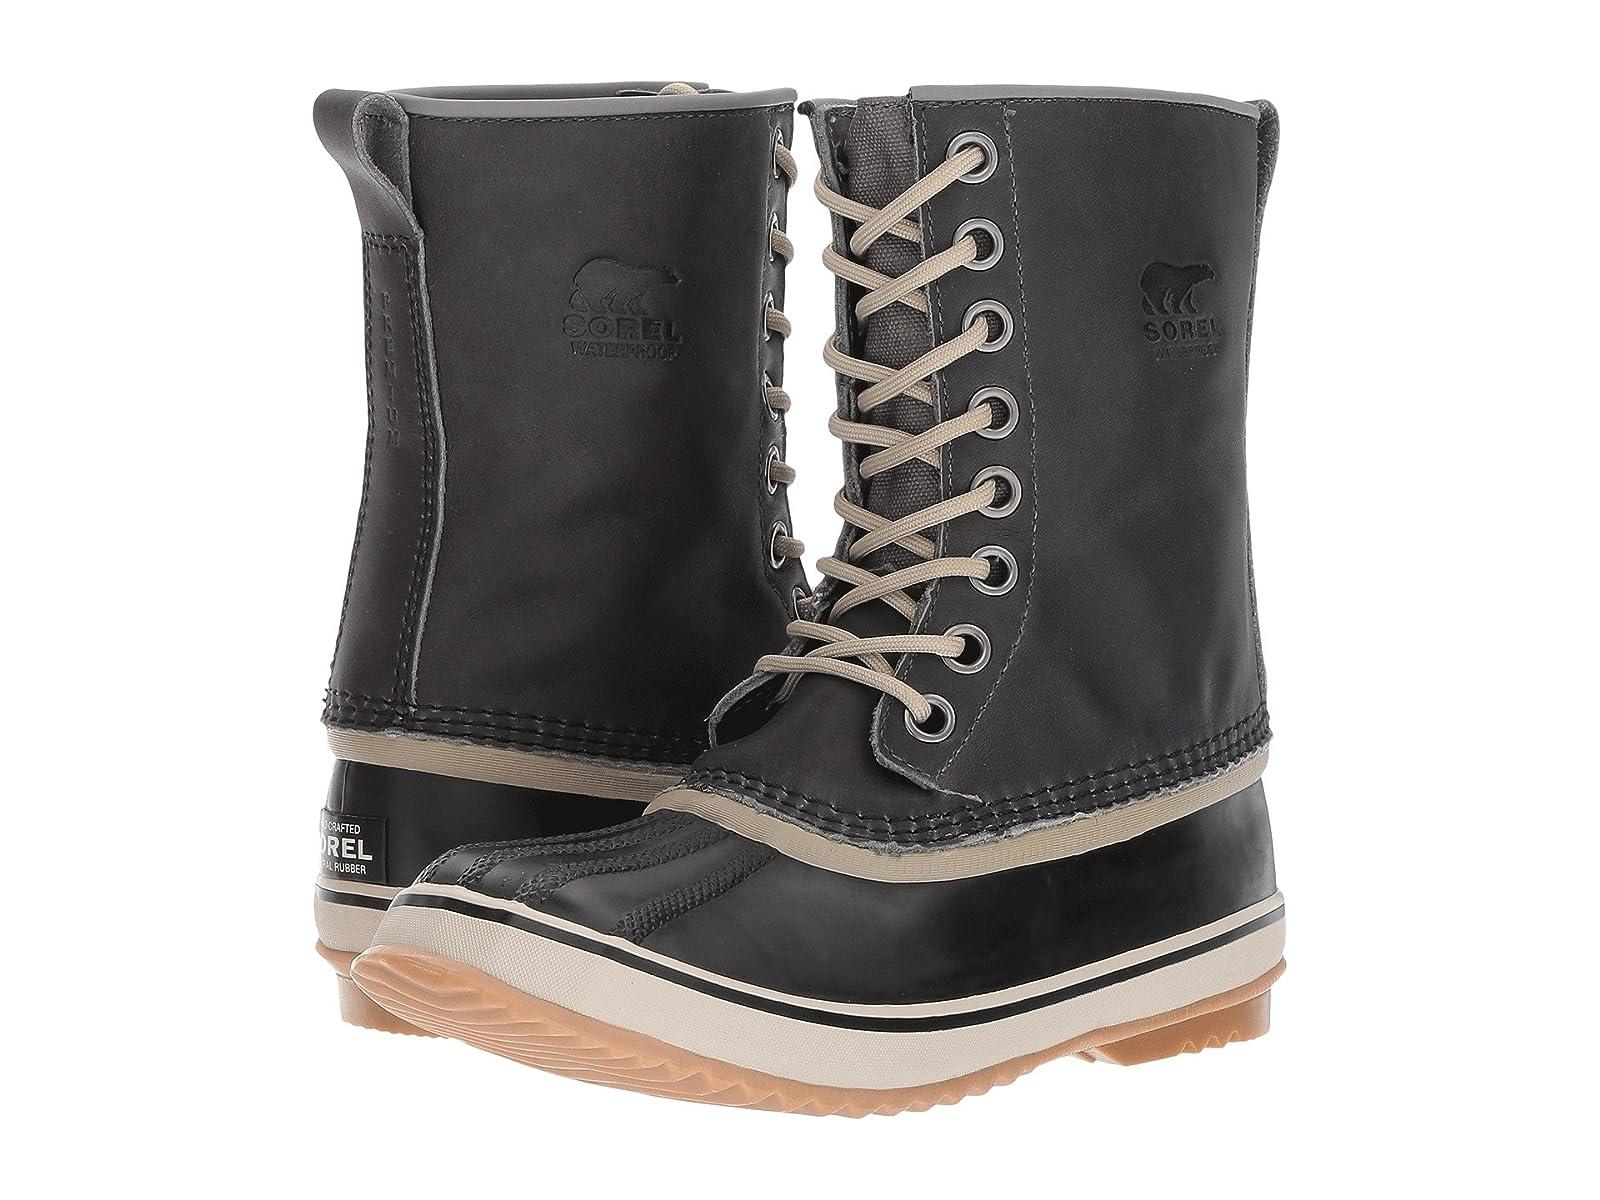 SOREL 1964 Premium™ LTREconomical and quality shoes